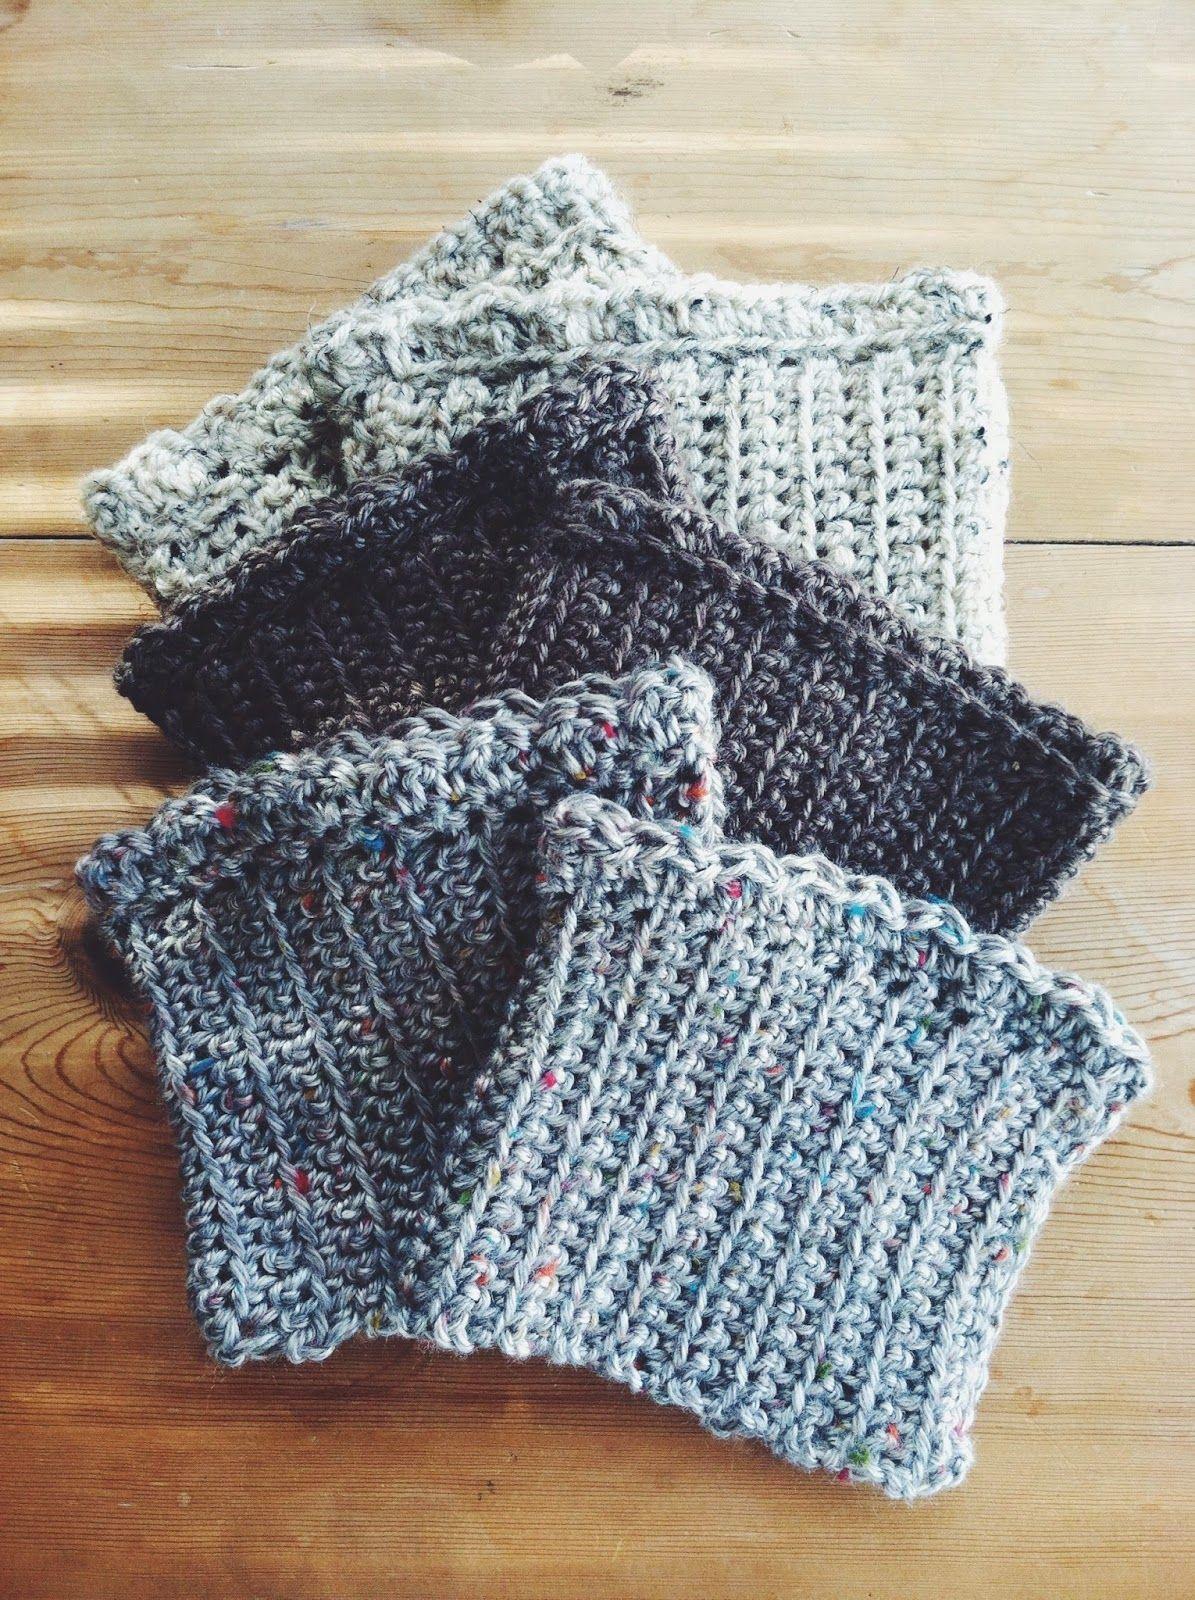 Erica freestone free crochet boot cuff pattern because sometimes erica freestone free crochet boot cuff pattern because sometimes i make things other than bankloansurffo Gallery